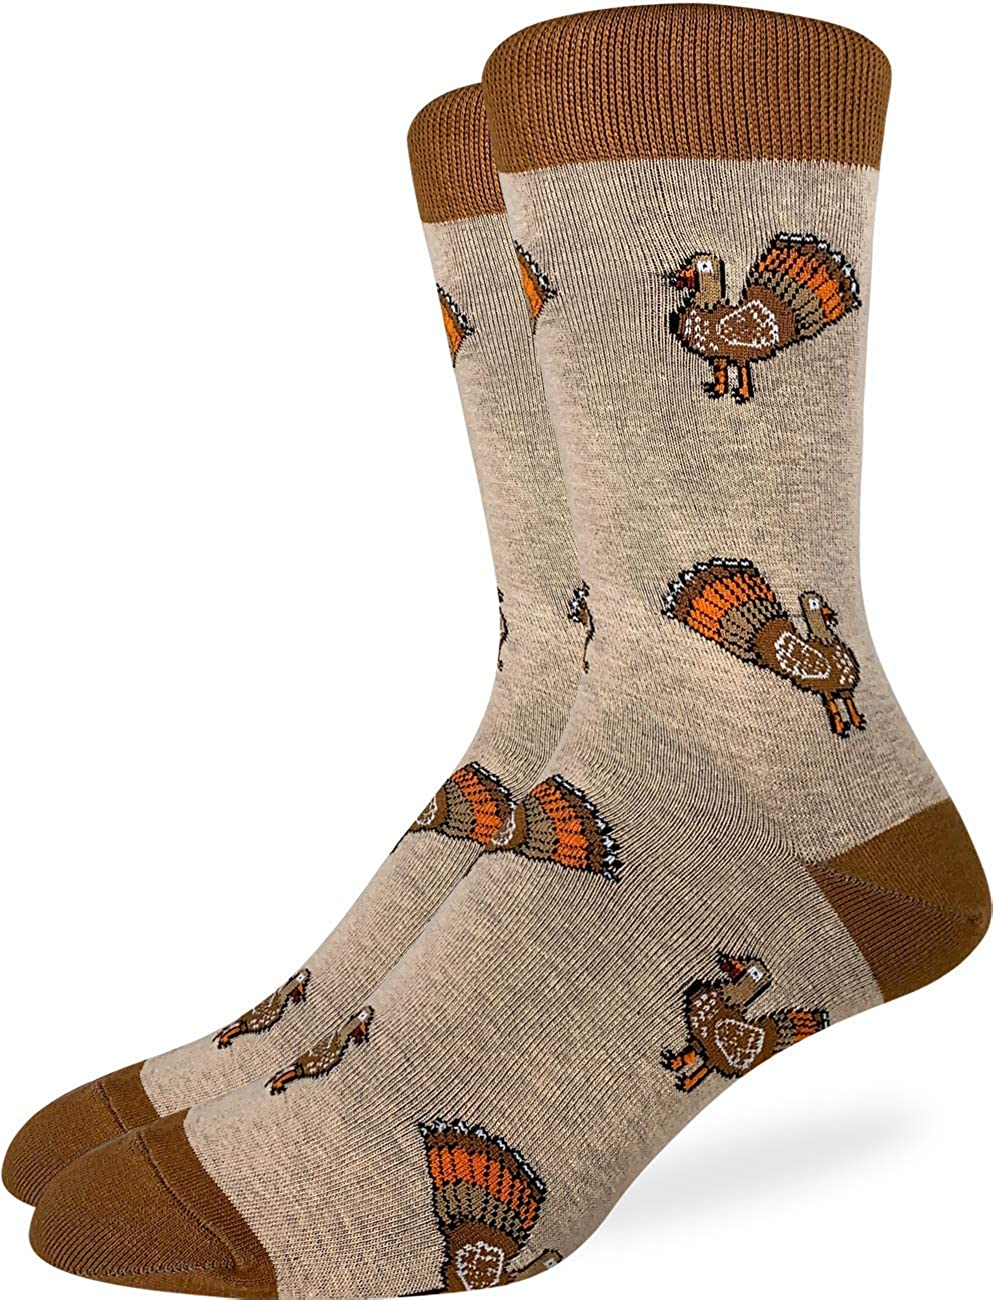 Good Luck Sock Men's Thanksgiving Turkey Socks - Brown, Adult Shoe Size 7-12